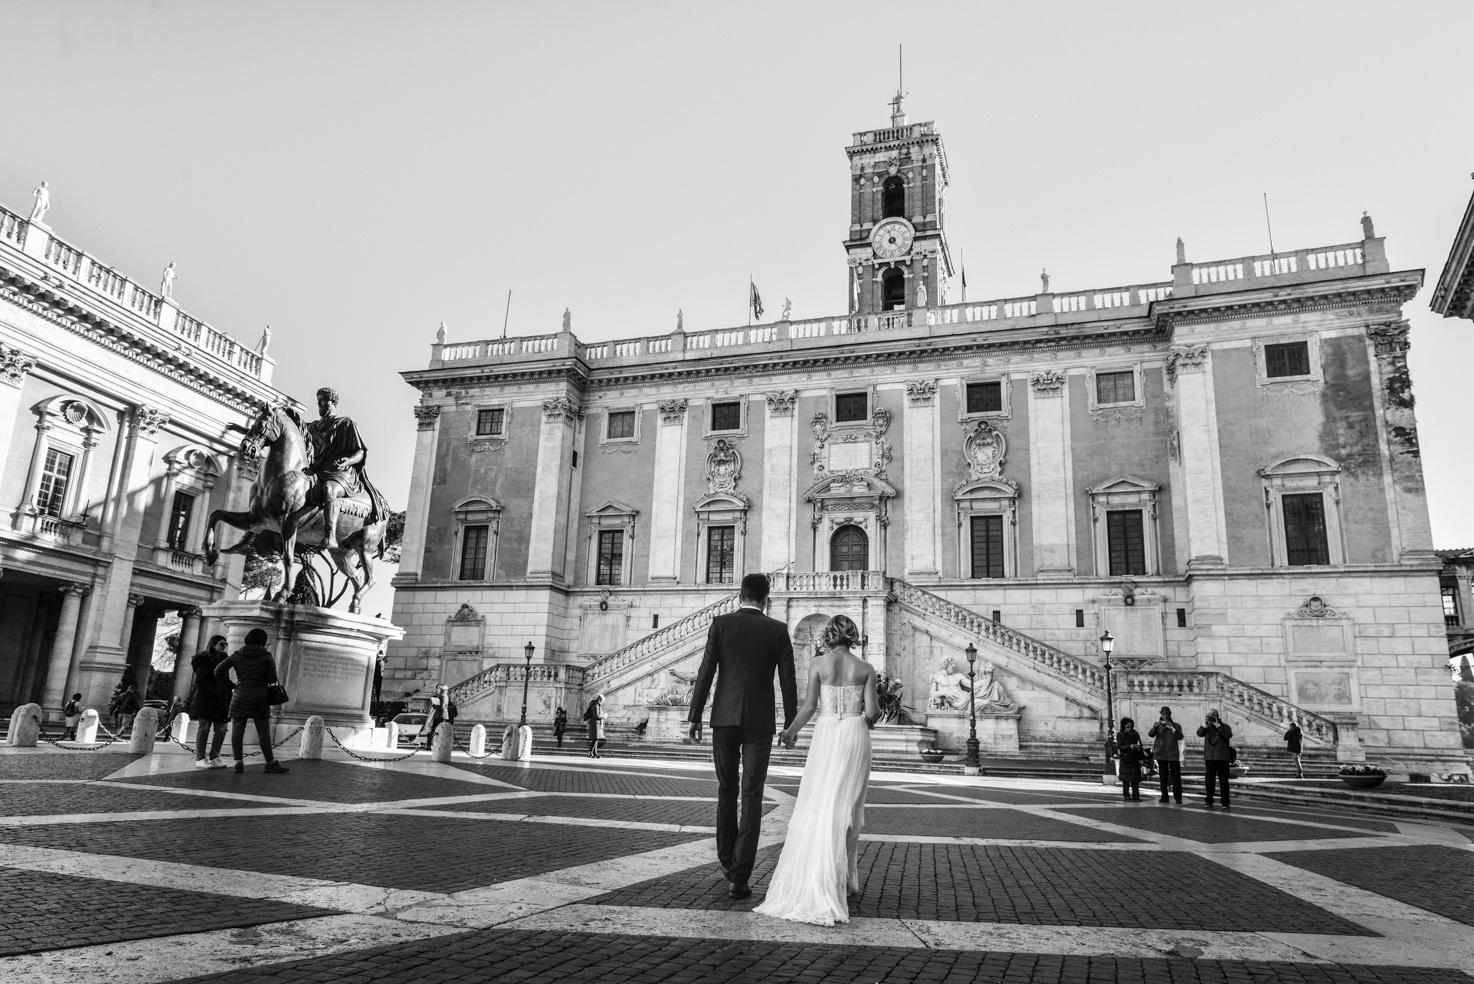 Campidoglio Palace for civil weddings in Rome